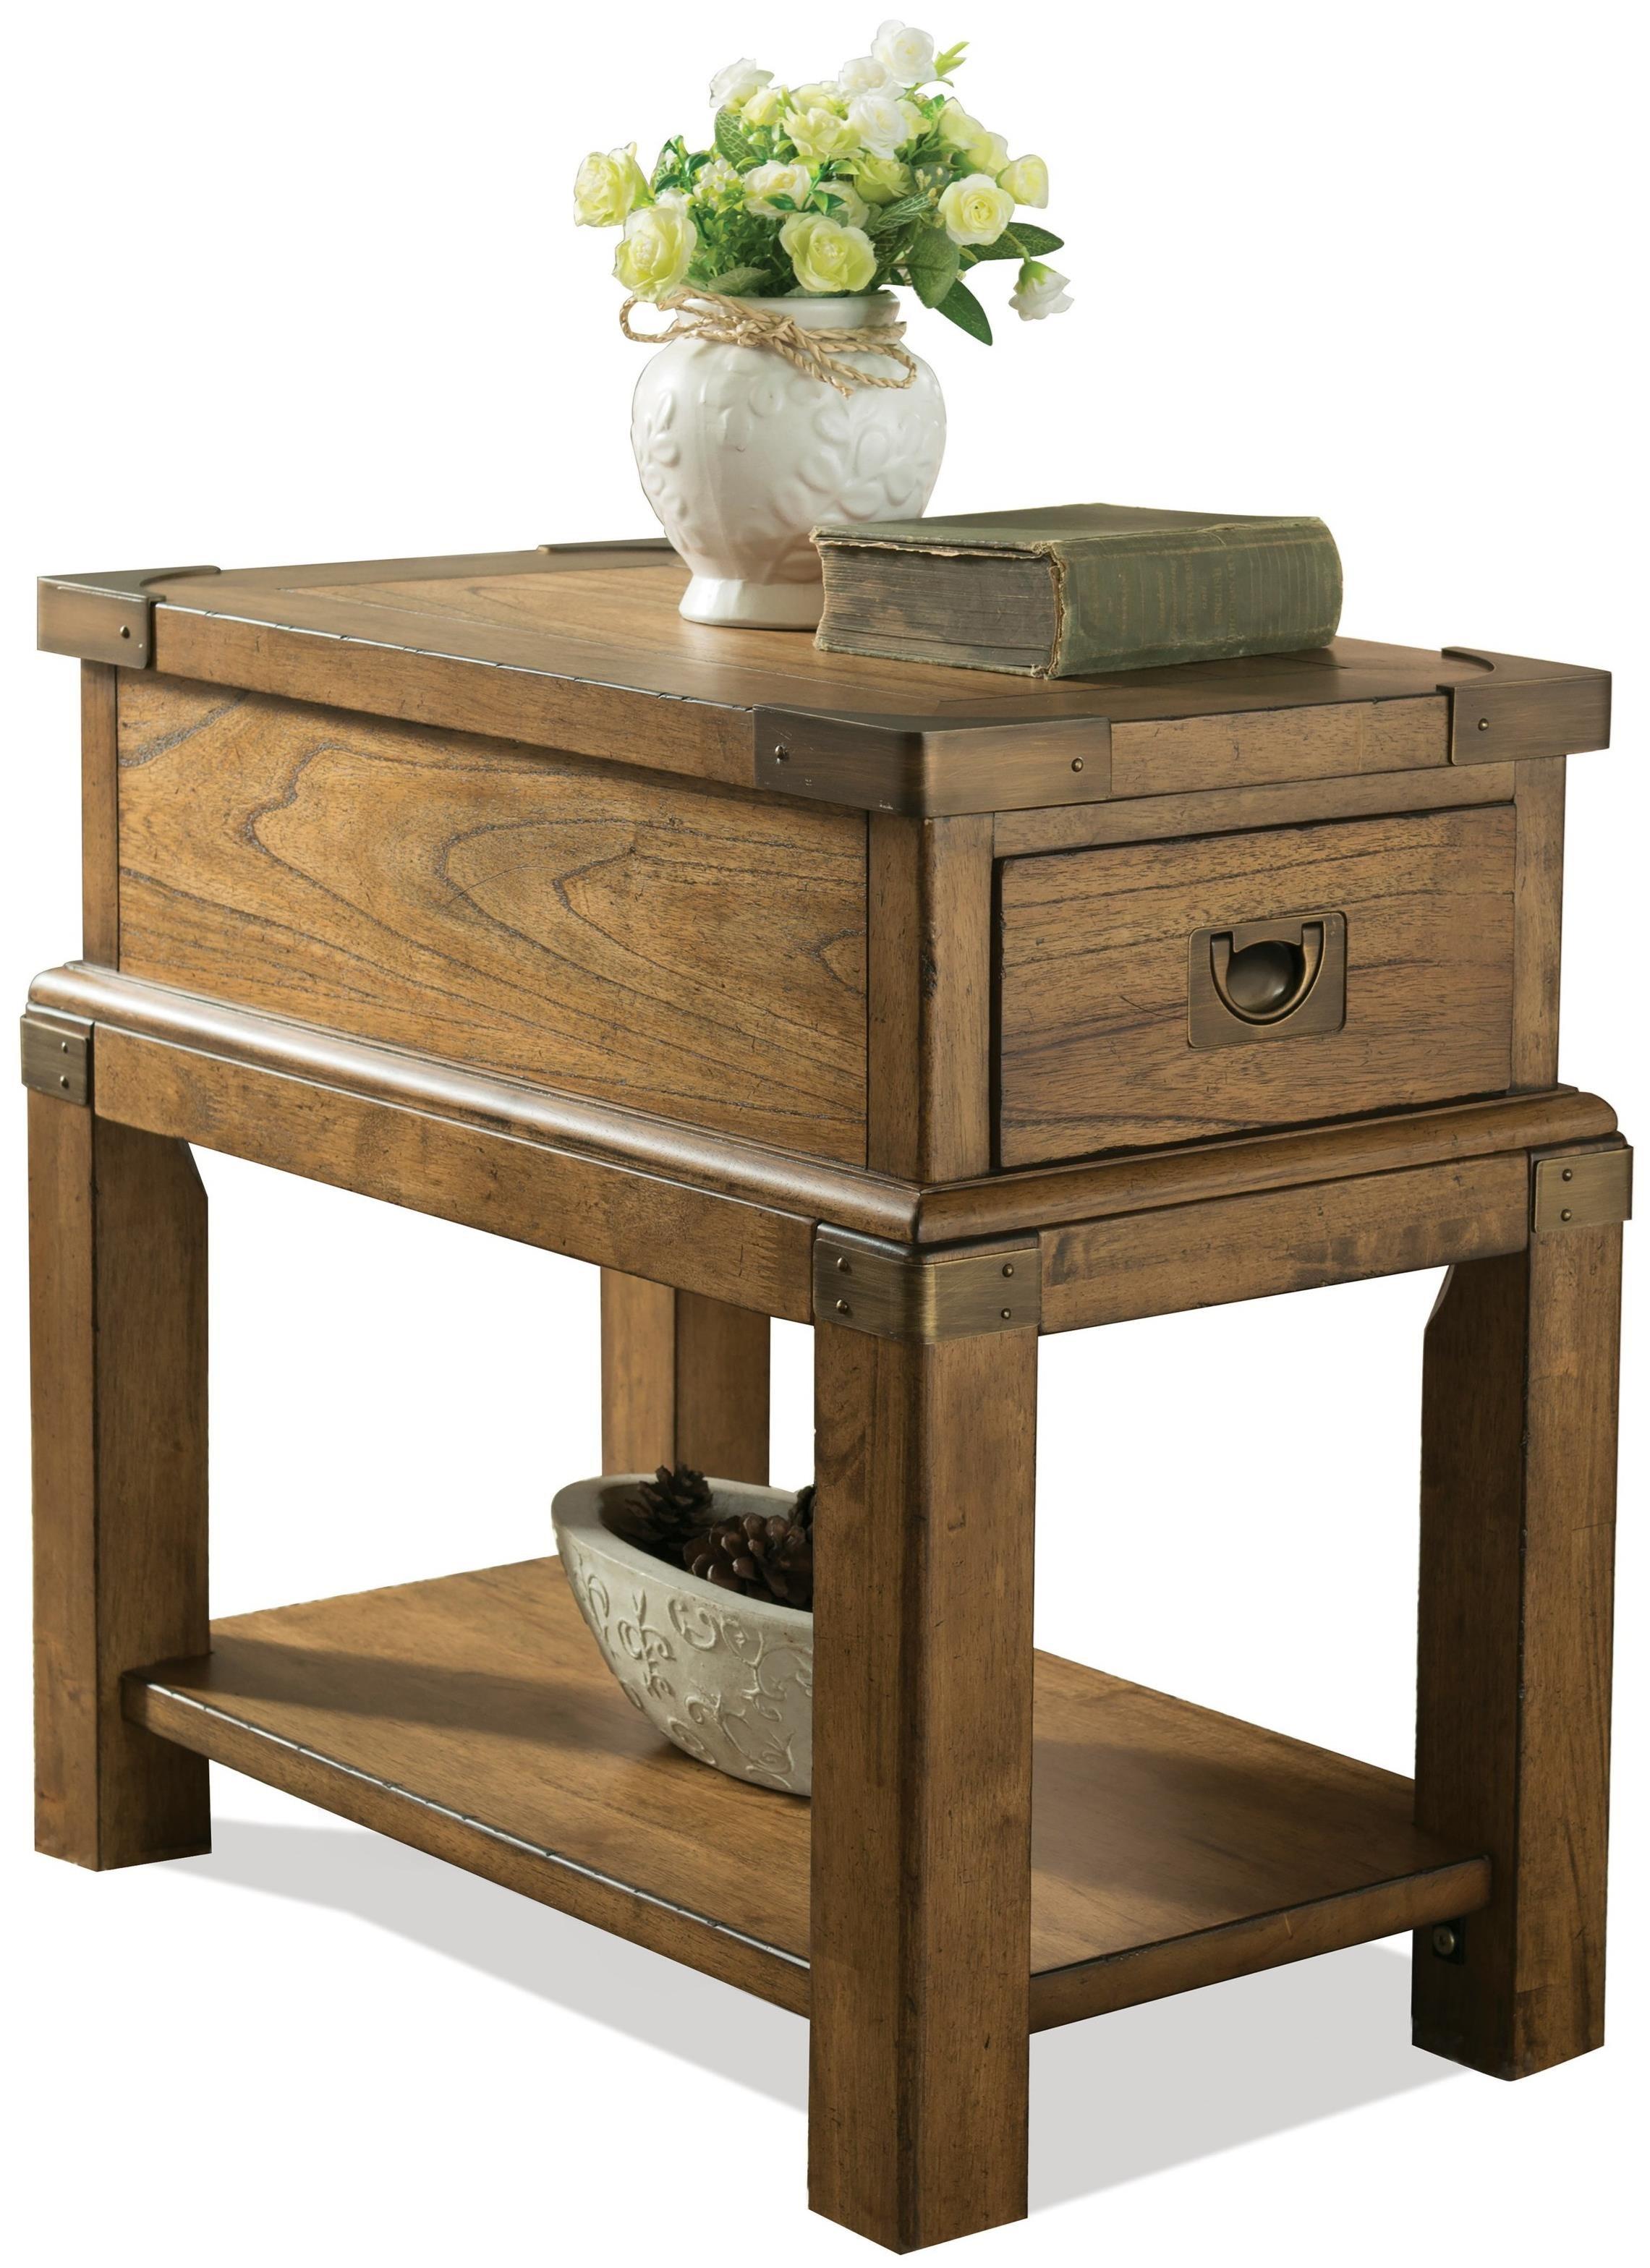 Riverside Furniture Falls Creek Chairside Table - Item Number: 16112